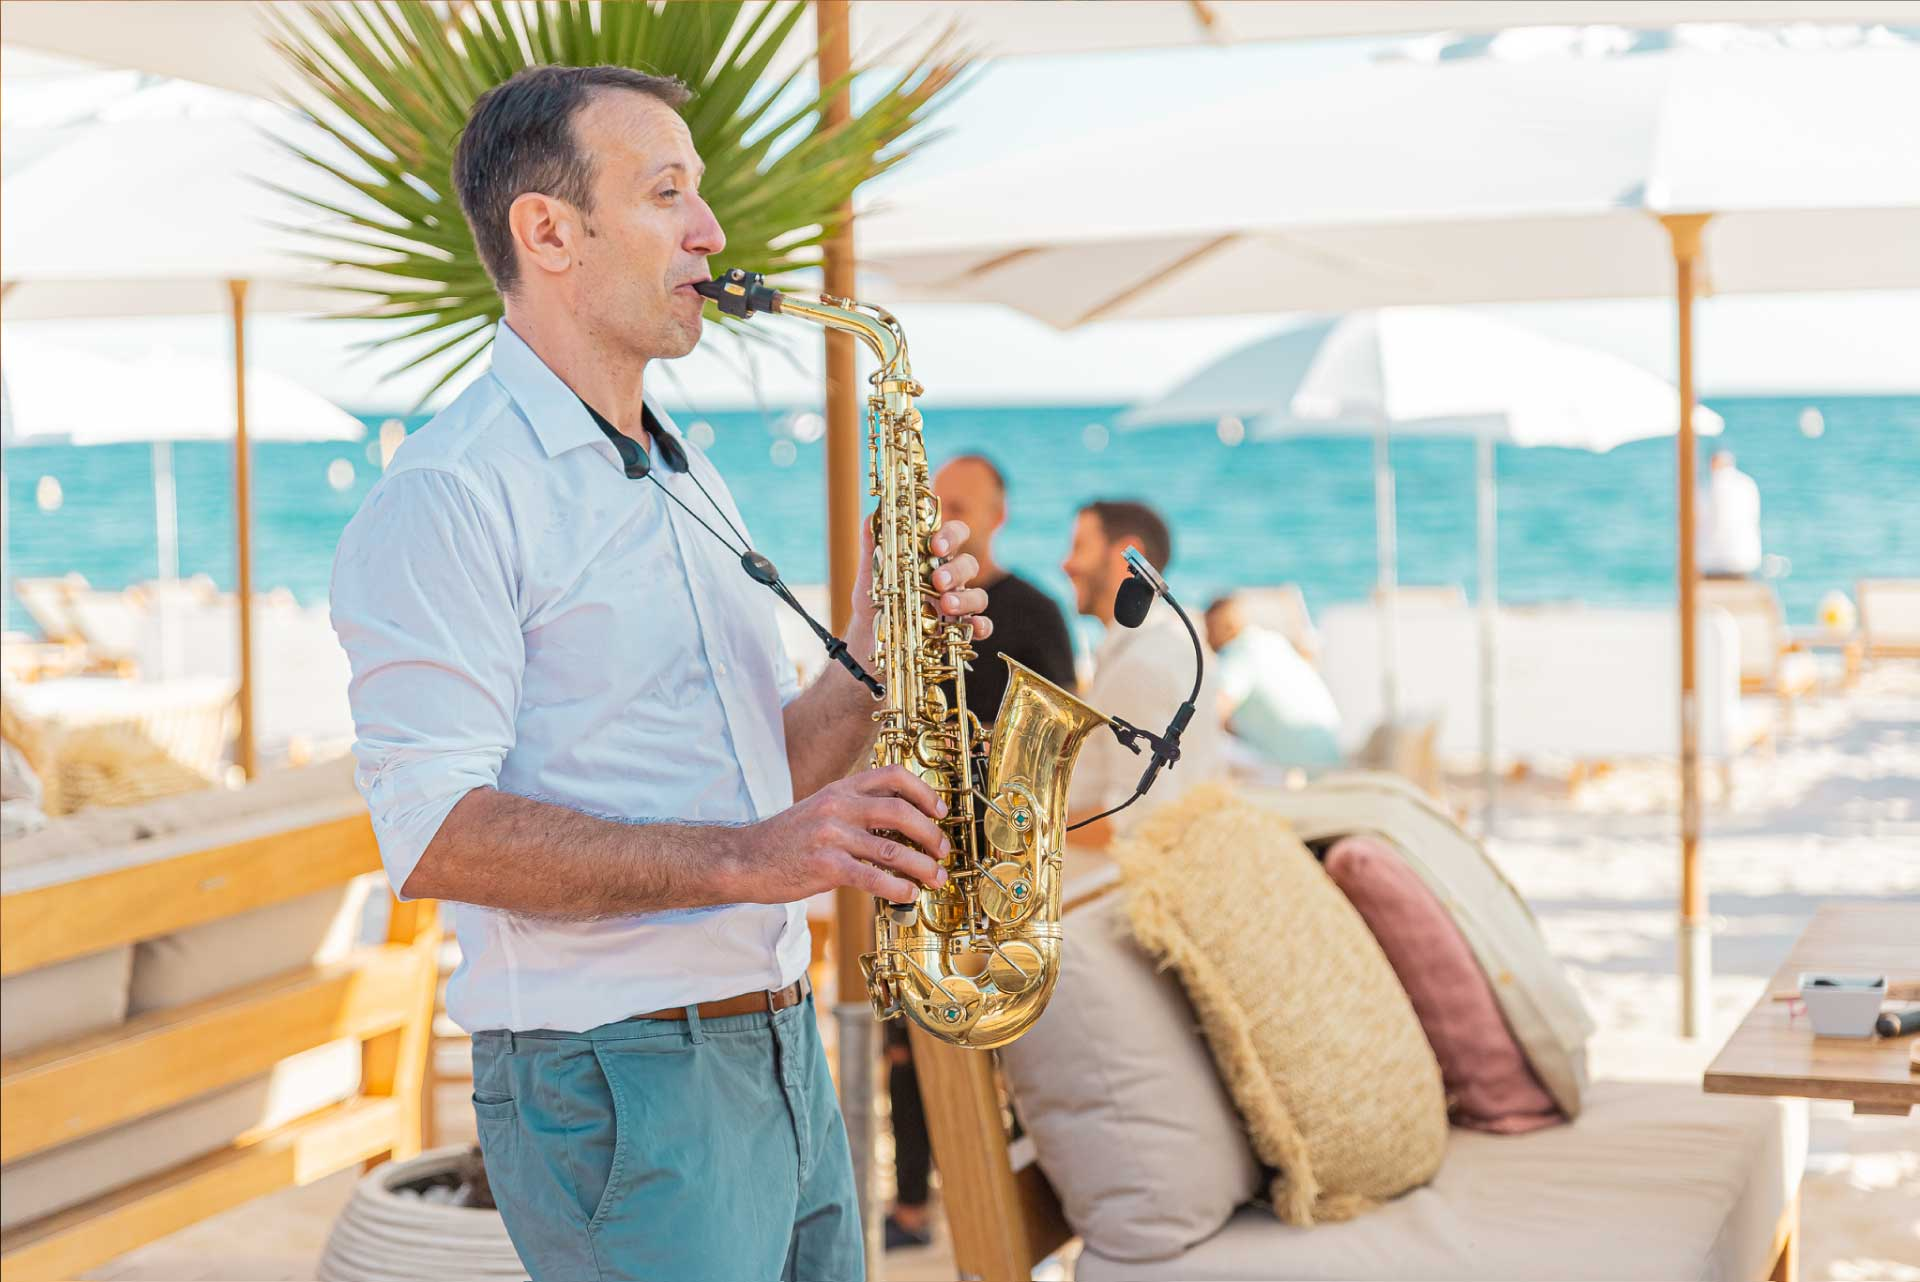 Miramar-plage-restaurant-gastronomique-cannes-saxophoniste